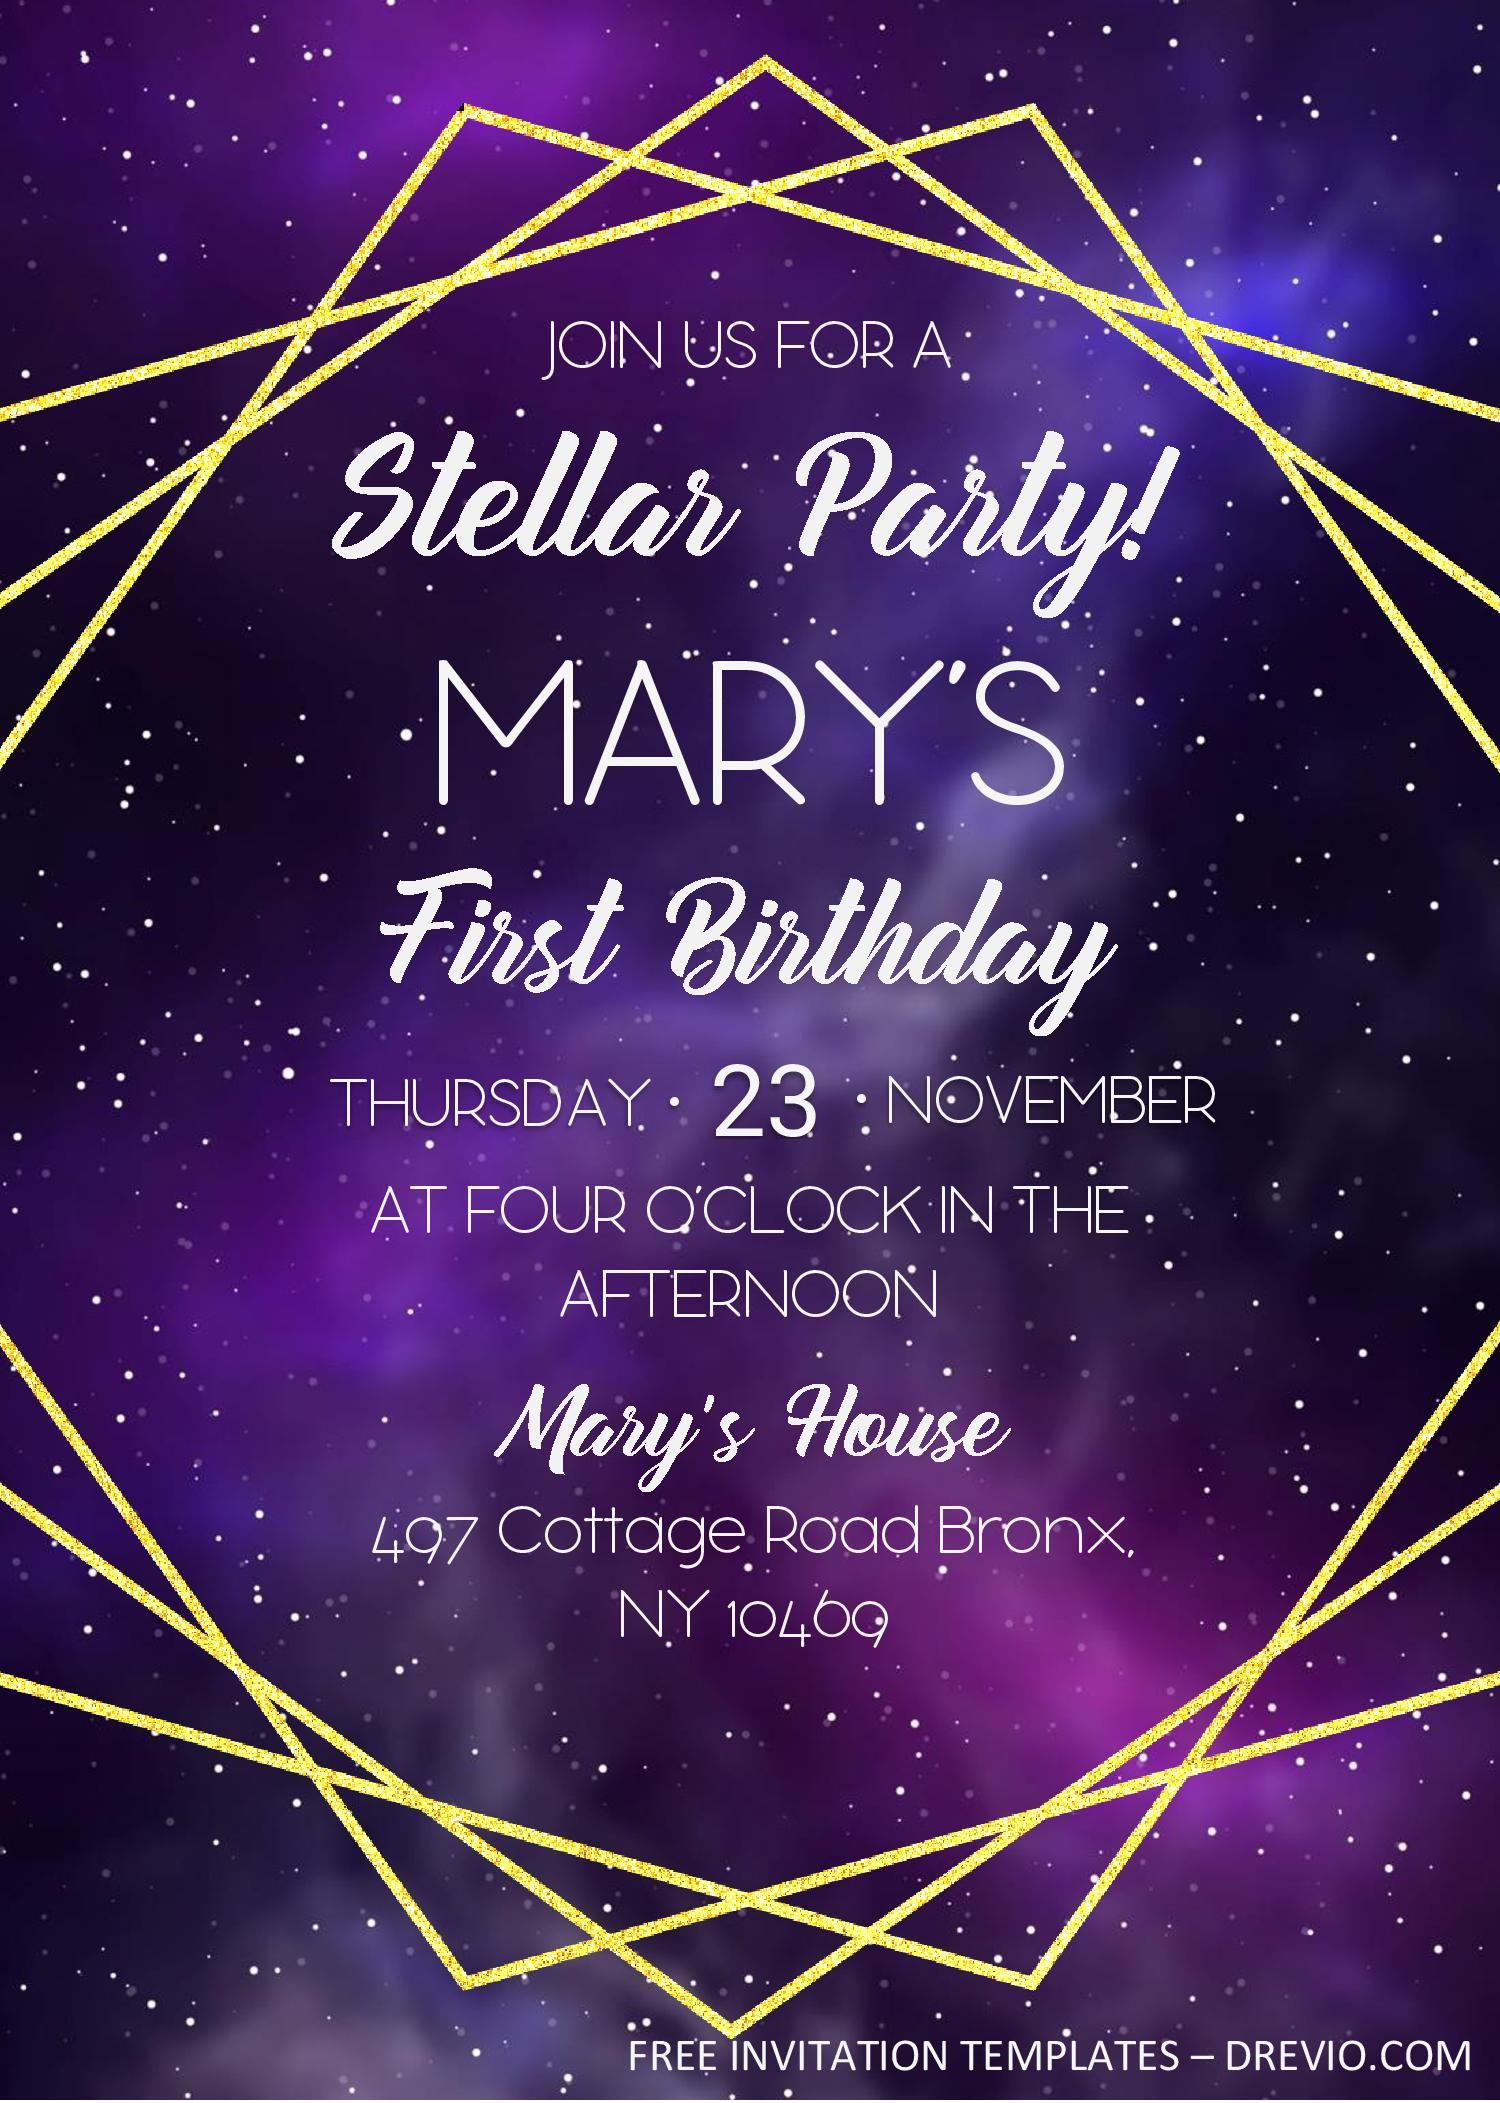 Galaxy Birthday Invitation Templates – Editable With MS Word